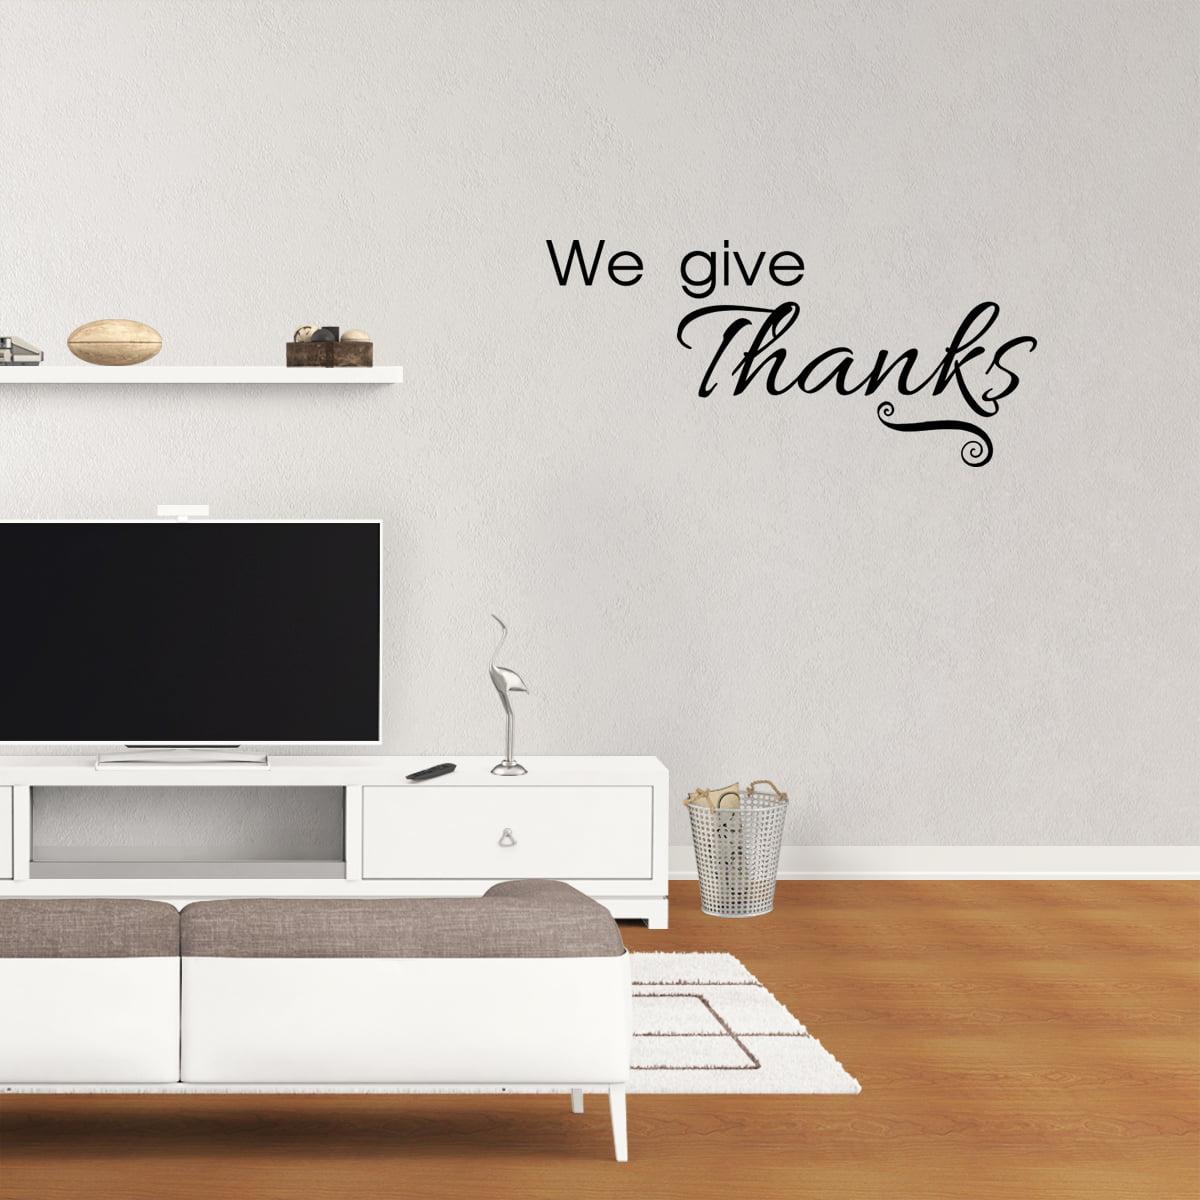 We Give Thanks Thanksgiving Decals Holiday Kitchen Vinyl Decal Dining Room Decor Quote Sticker Xj649 Walmart Com Walmart Com